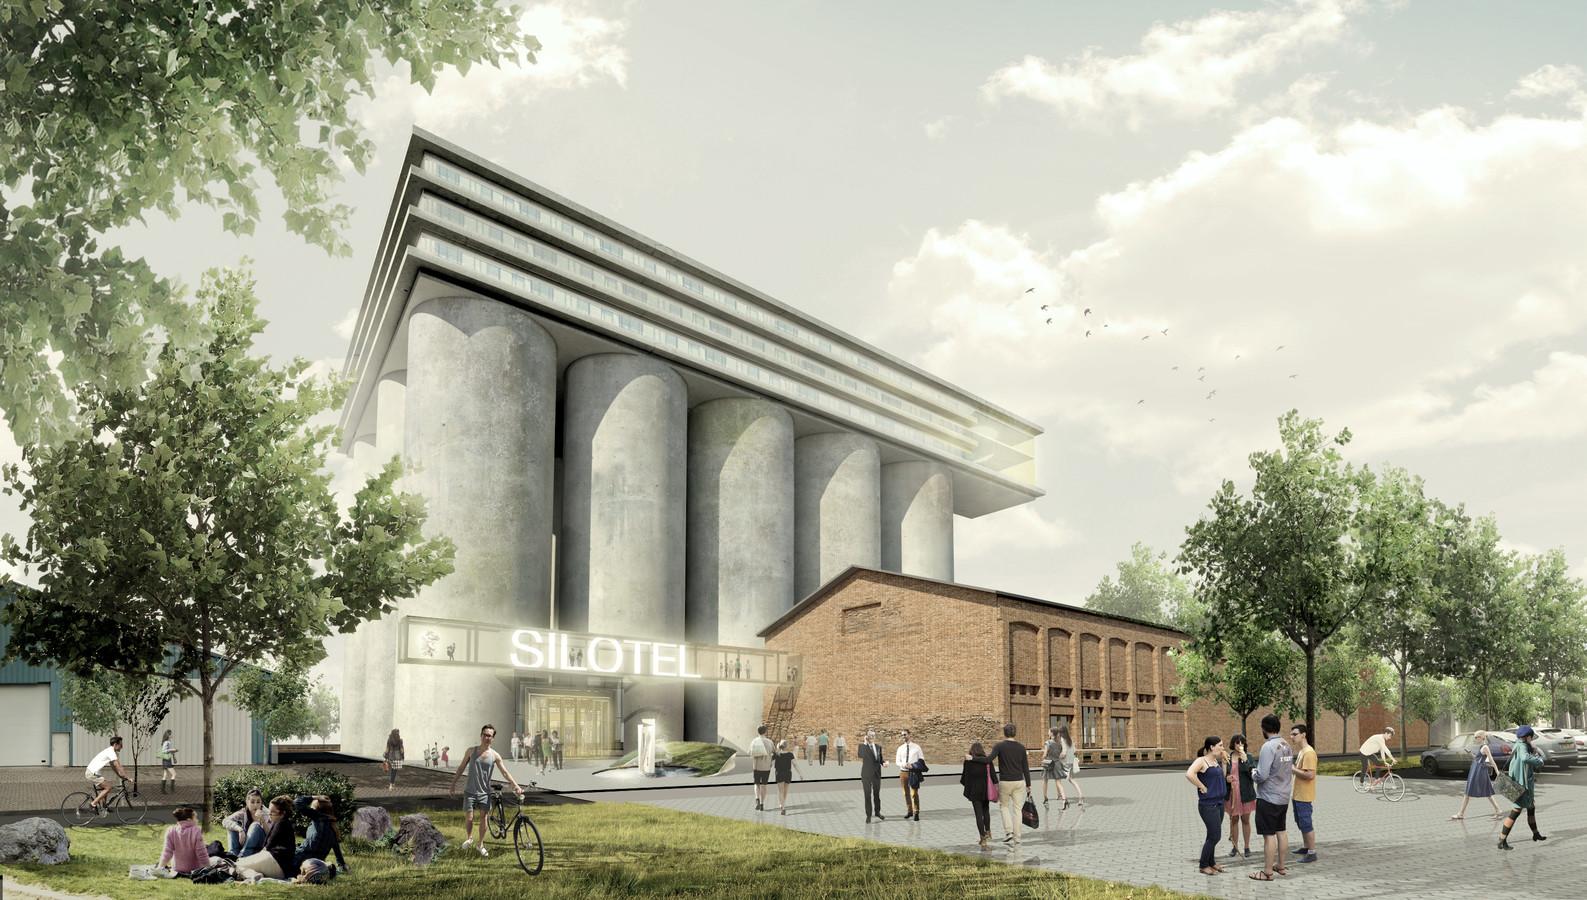 Artist impression 'silotel' Noordkade Veghel. Ontwerp door de Architekten Cie., architecten: Pi de Bruijn en Wessel Vreugdenhil, www.cie.nl